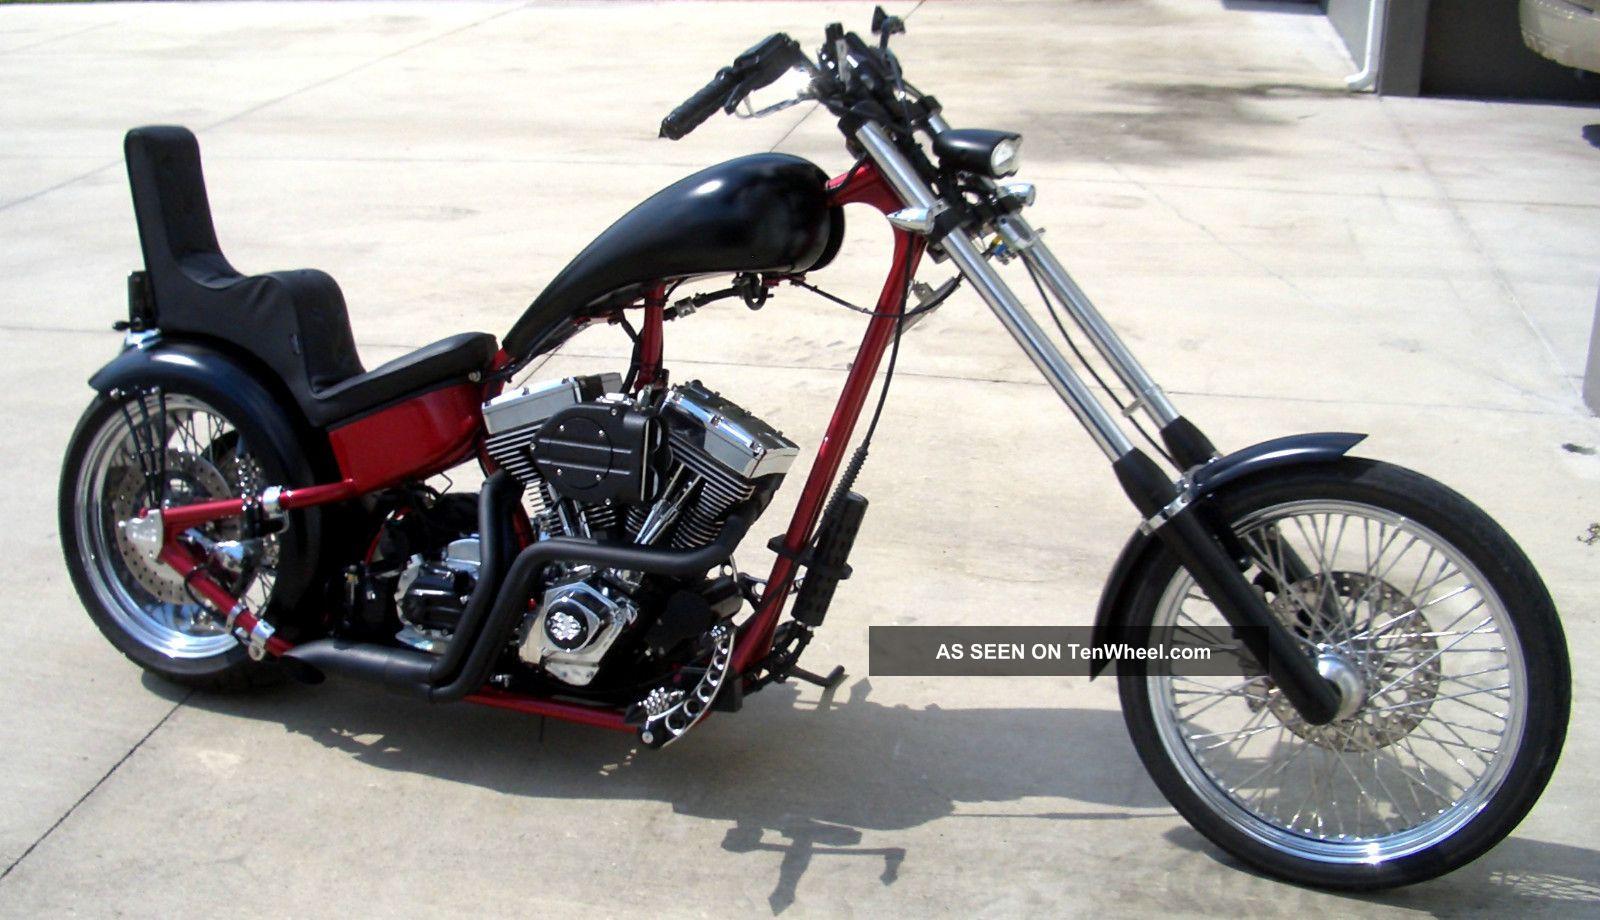 Harley Custom Built 2012 Chopper Other photo